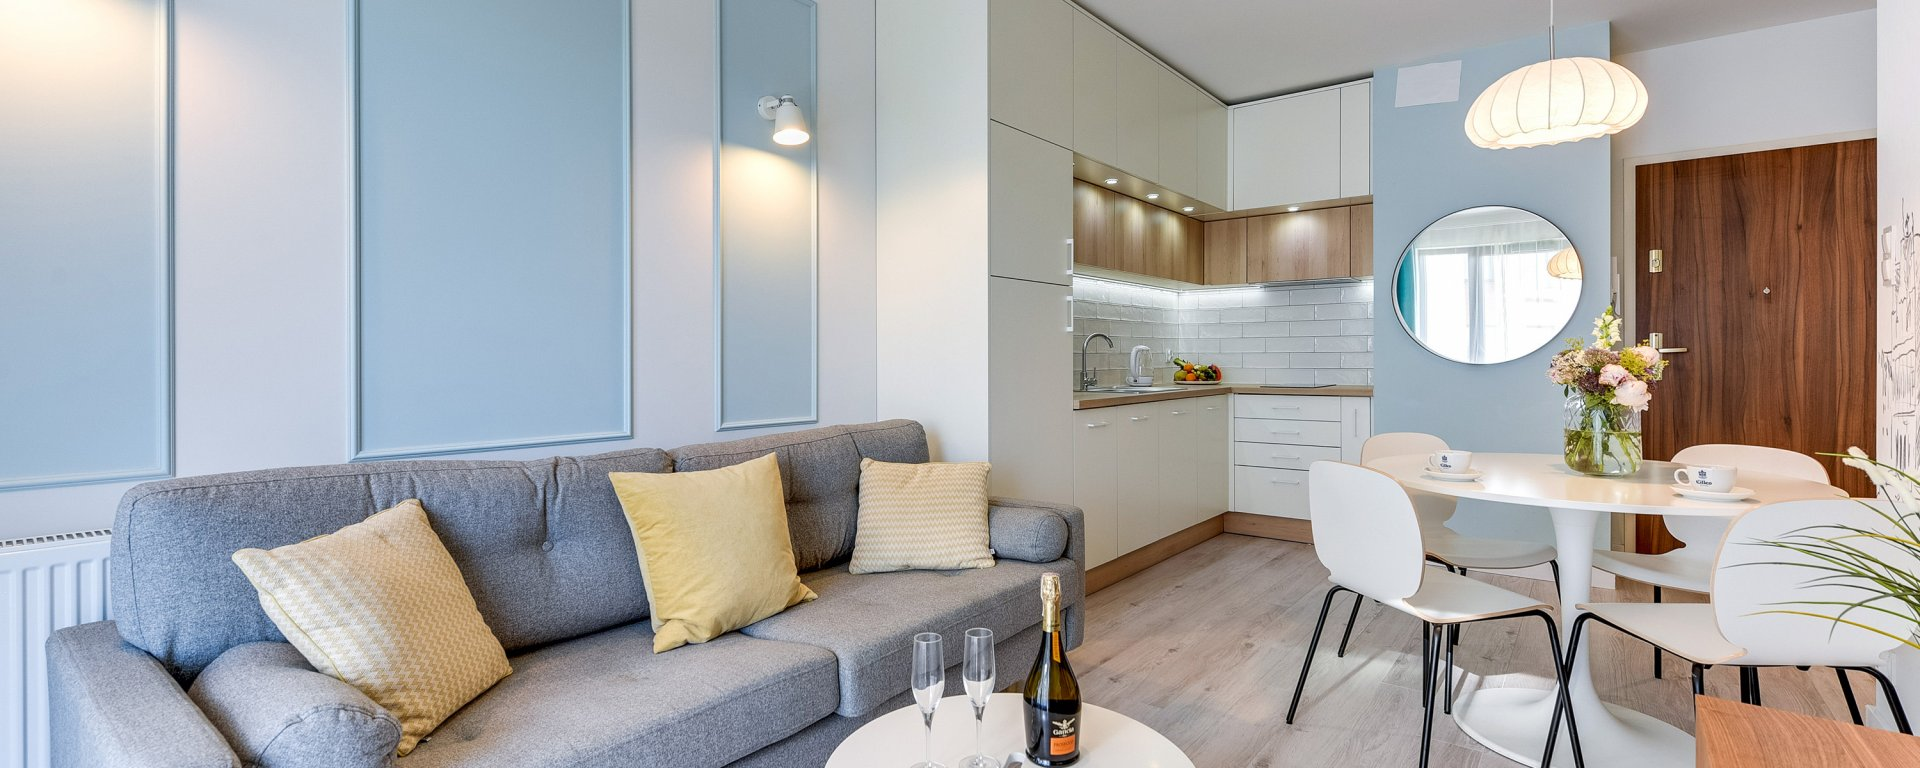 Grano Apartments Nowa Motława - 1 Sypialnia, Balkon